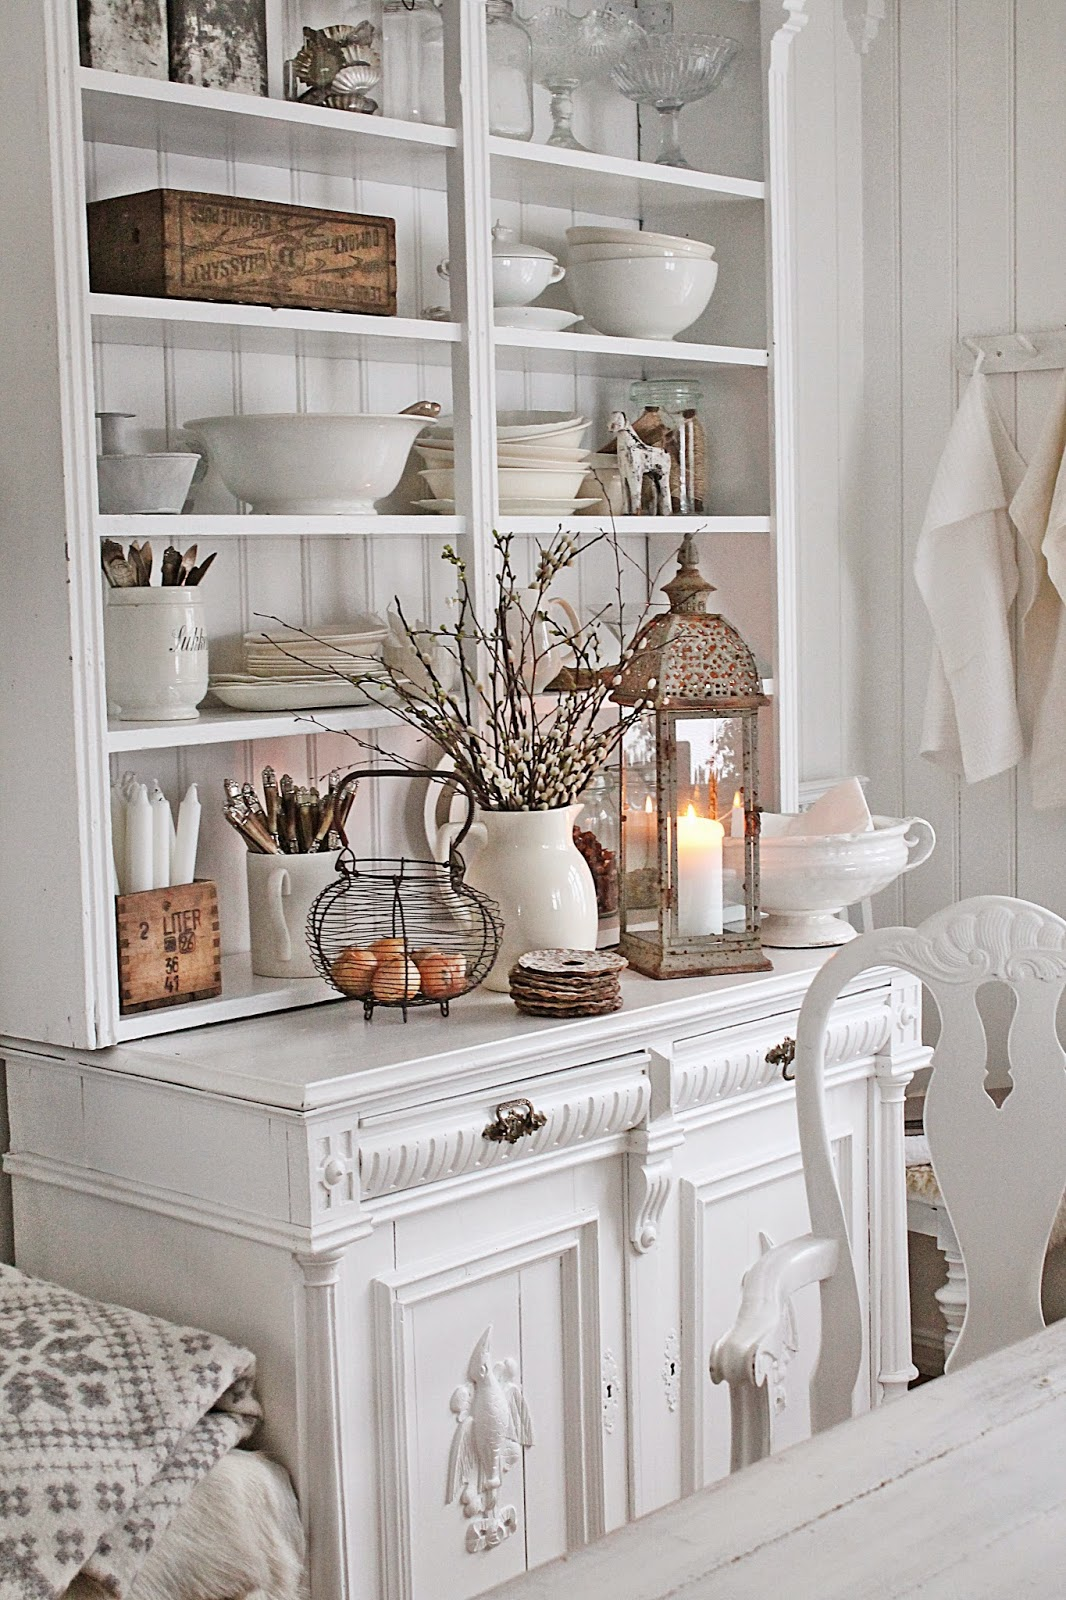 dekor/vesennii-dekor-svoimi-rukami-foto-8.jpg